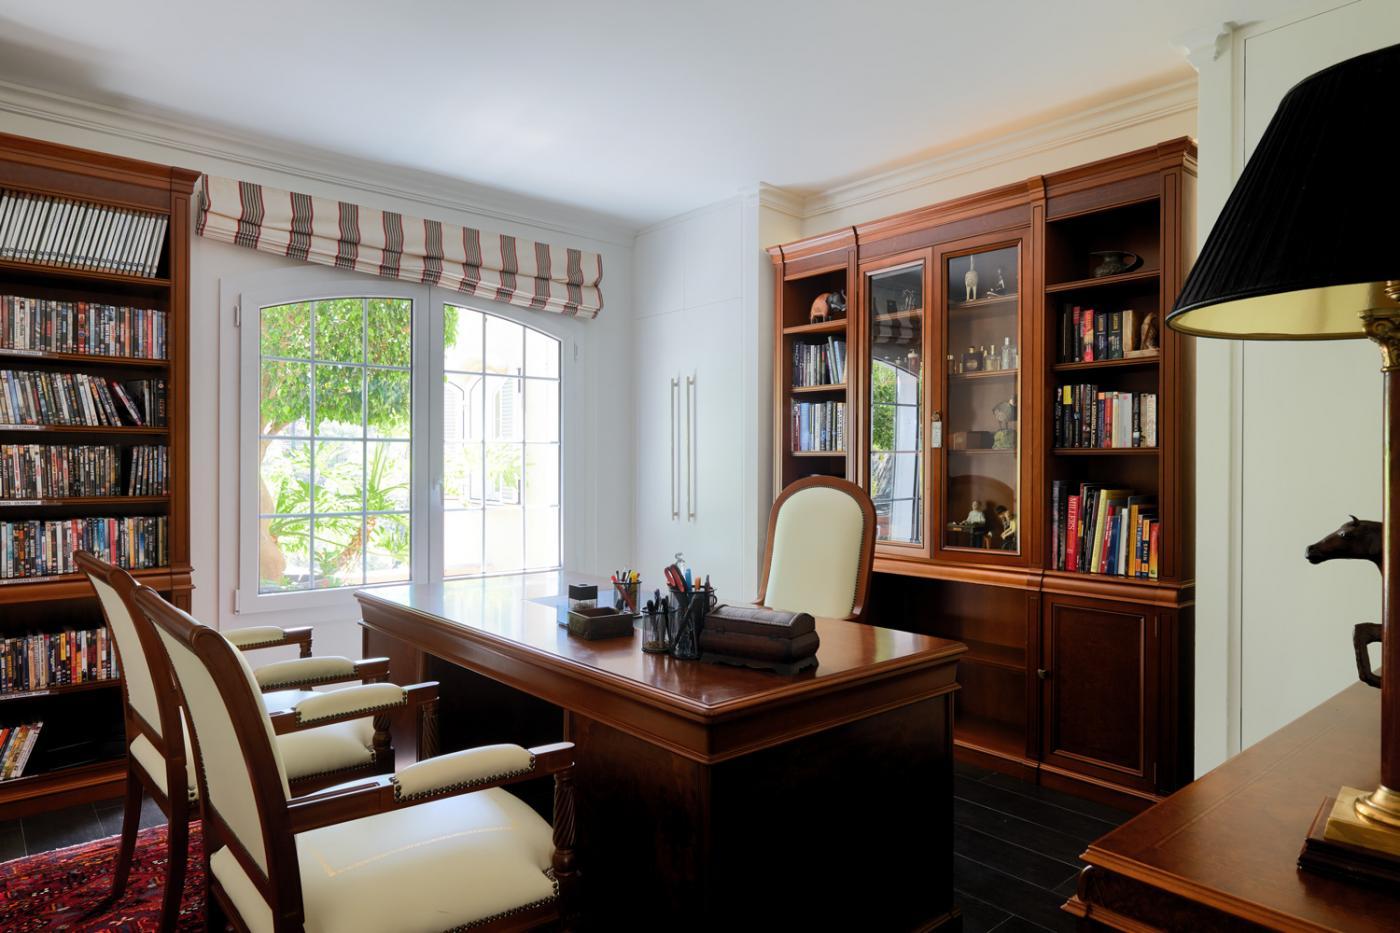 5 Bedroom Coastal Property Country Style Living for Sale in Benahavis